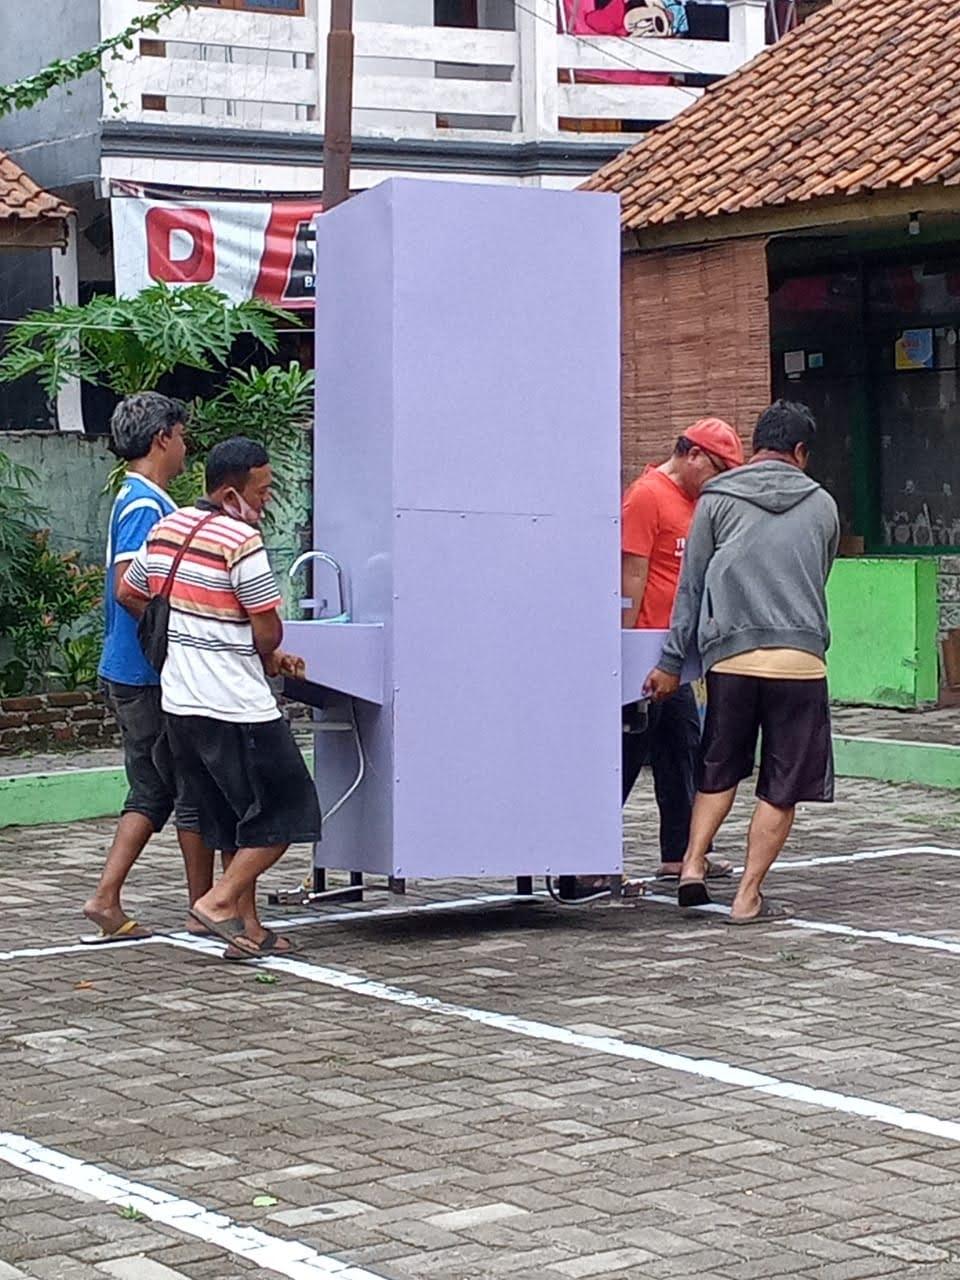 Foto Bantuan Wastafel dari Dinas Pendidikan Kota Bandung